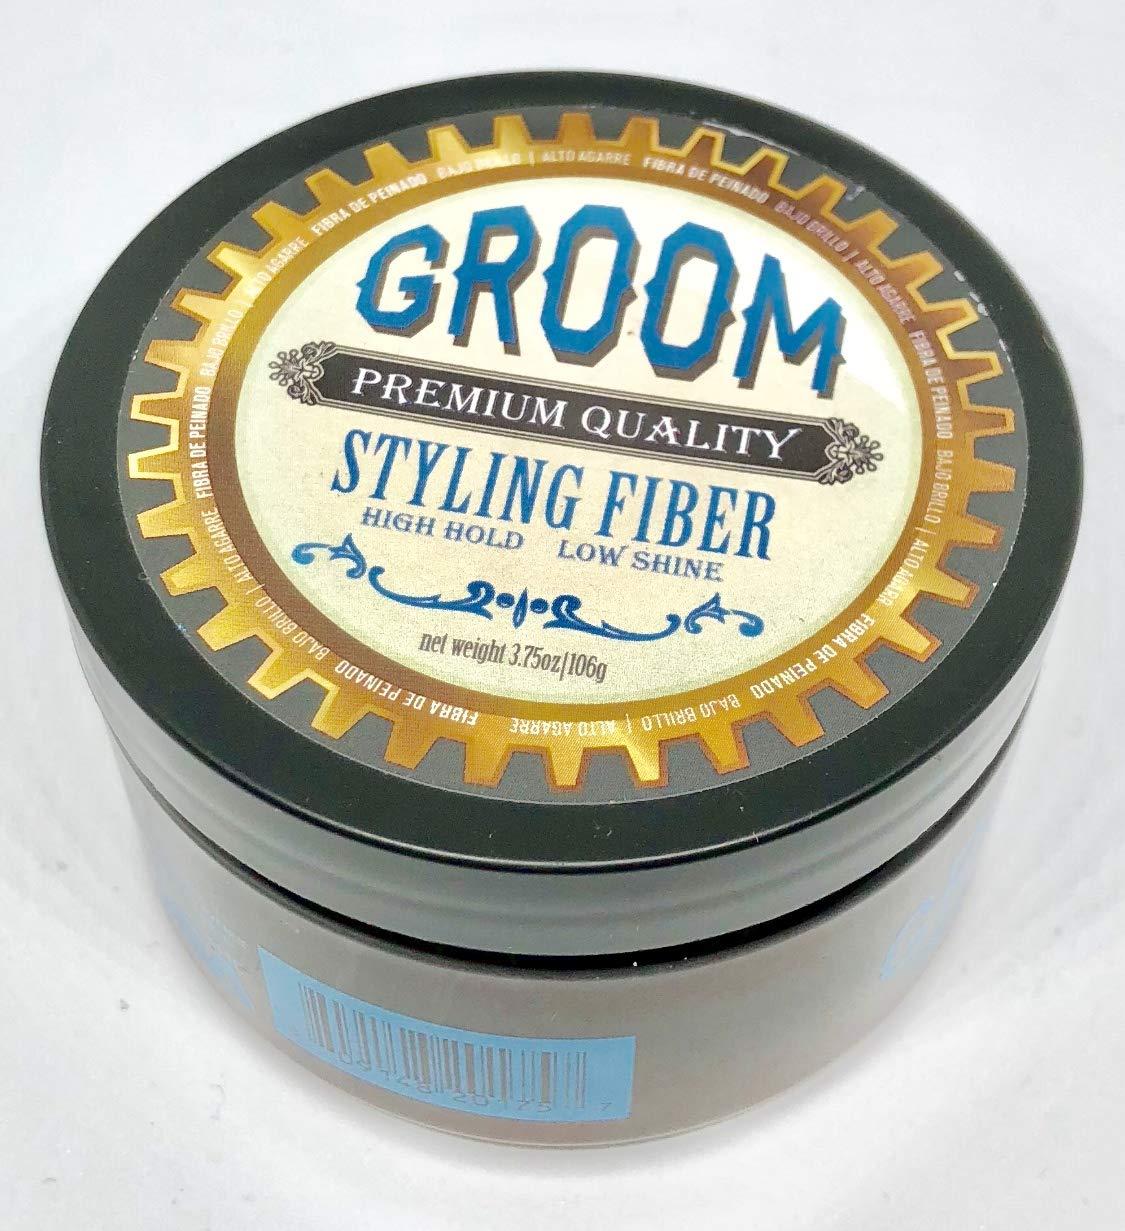 Groom Premium Quality Forming Cream w/Medium Hold & Medium Shine. 3.75oz | 106g (Styling Fiber) by Groom Premium Quality